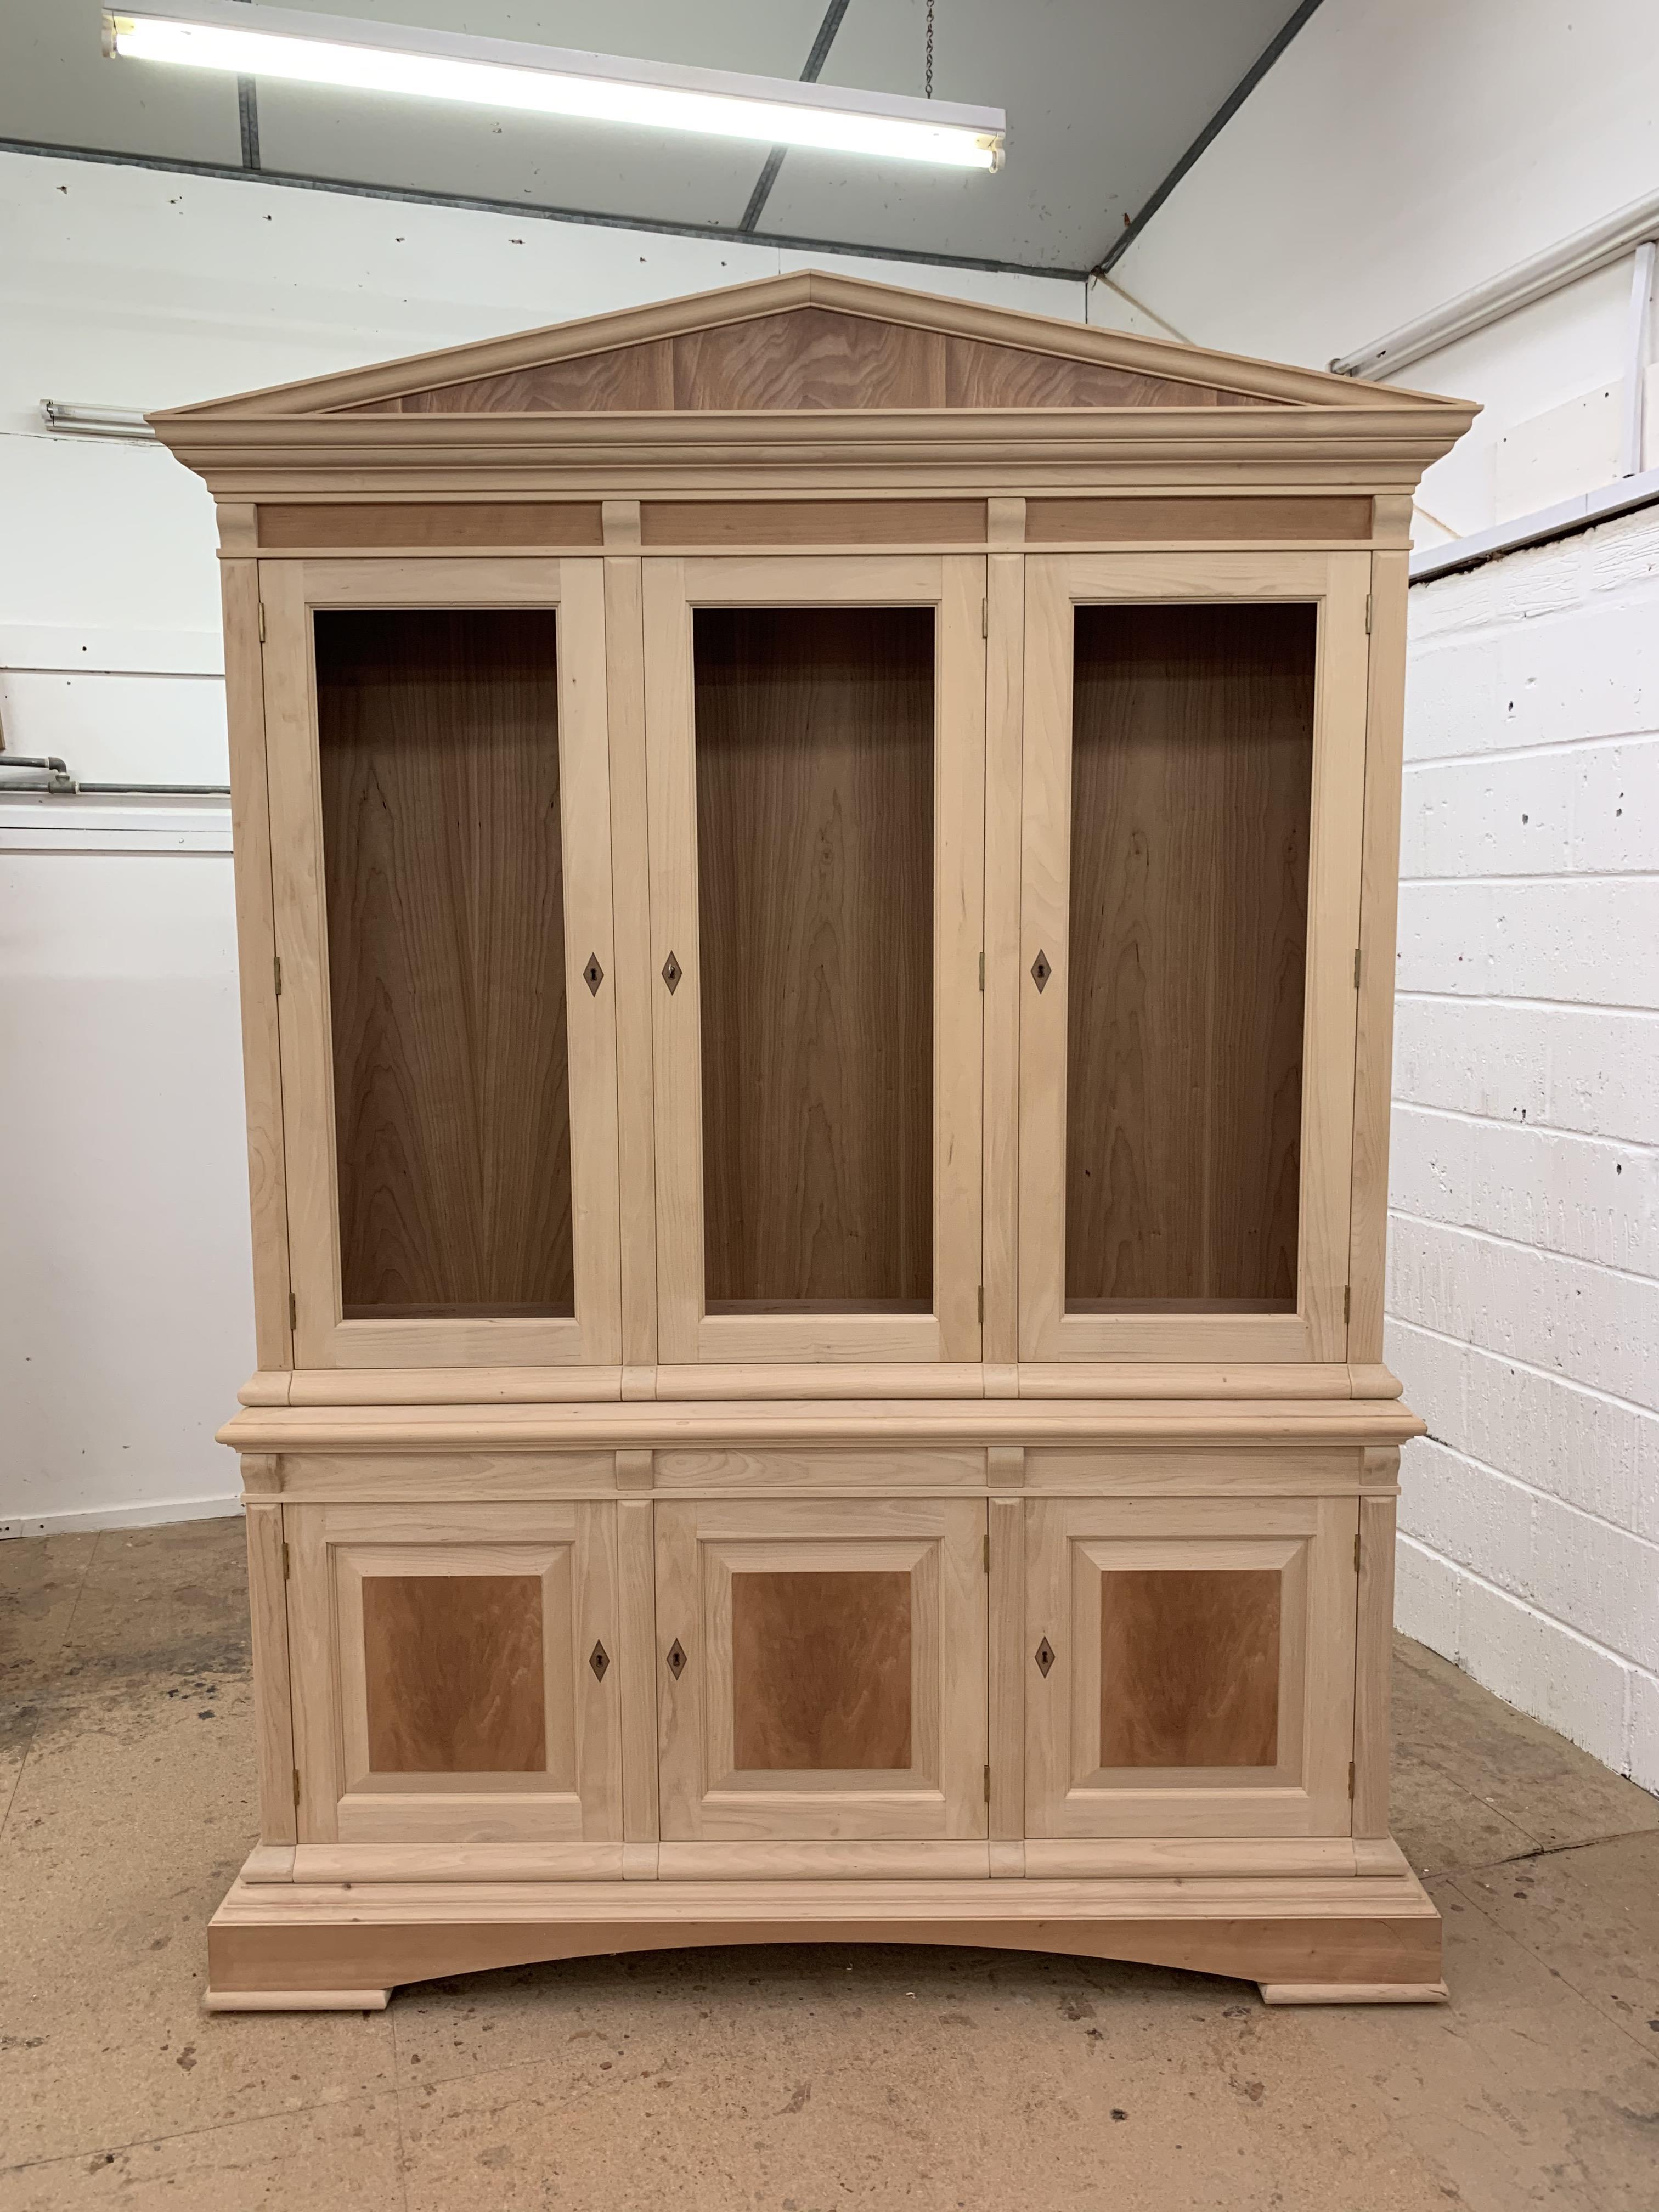 Lot 45 - Three door Bookcase, with pediment, from the Trafalgar Cherry range, requires finishing/polishing.